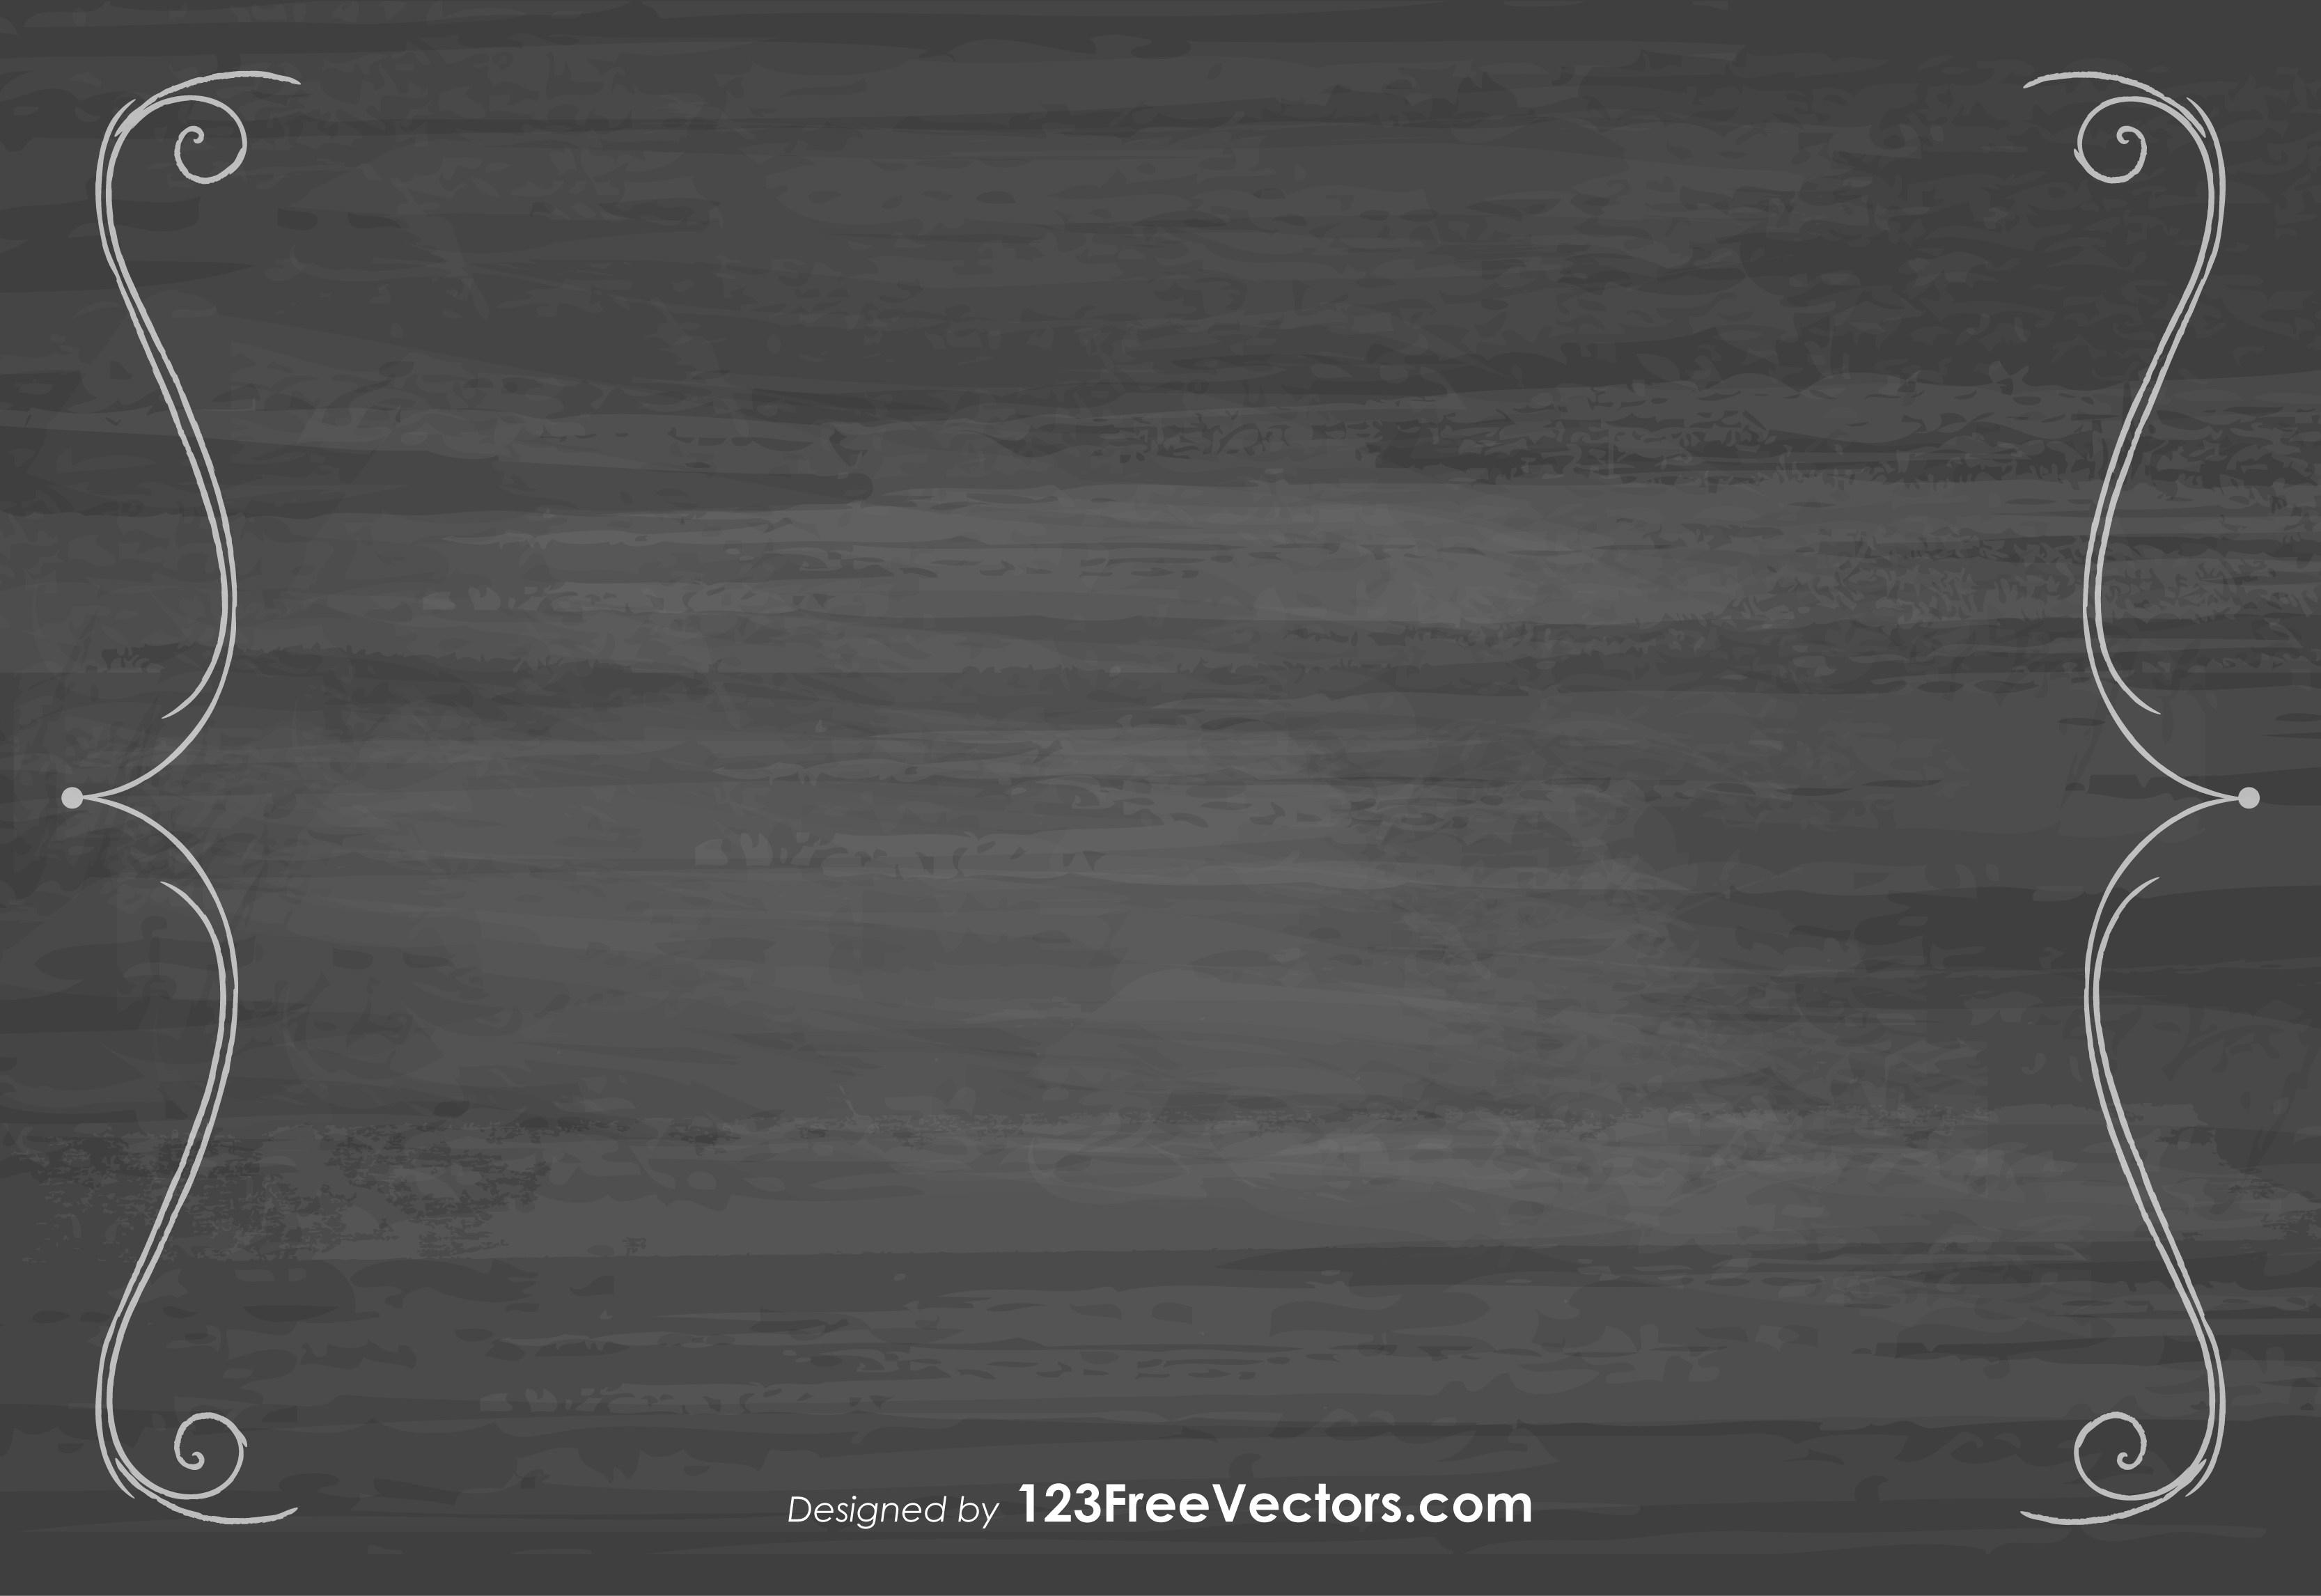 120+ Chalkboard Background Vectors.